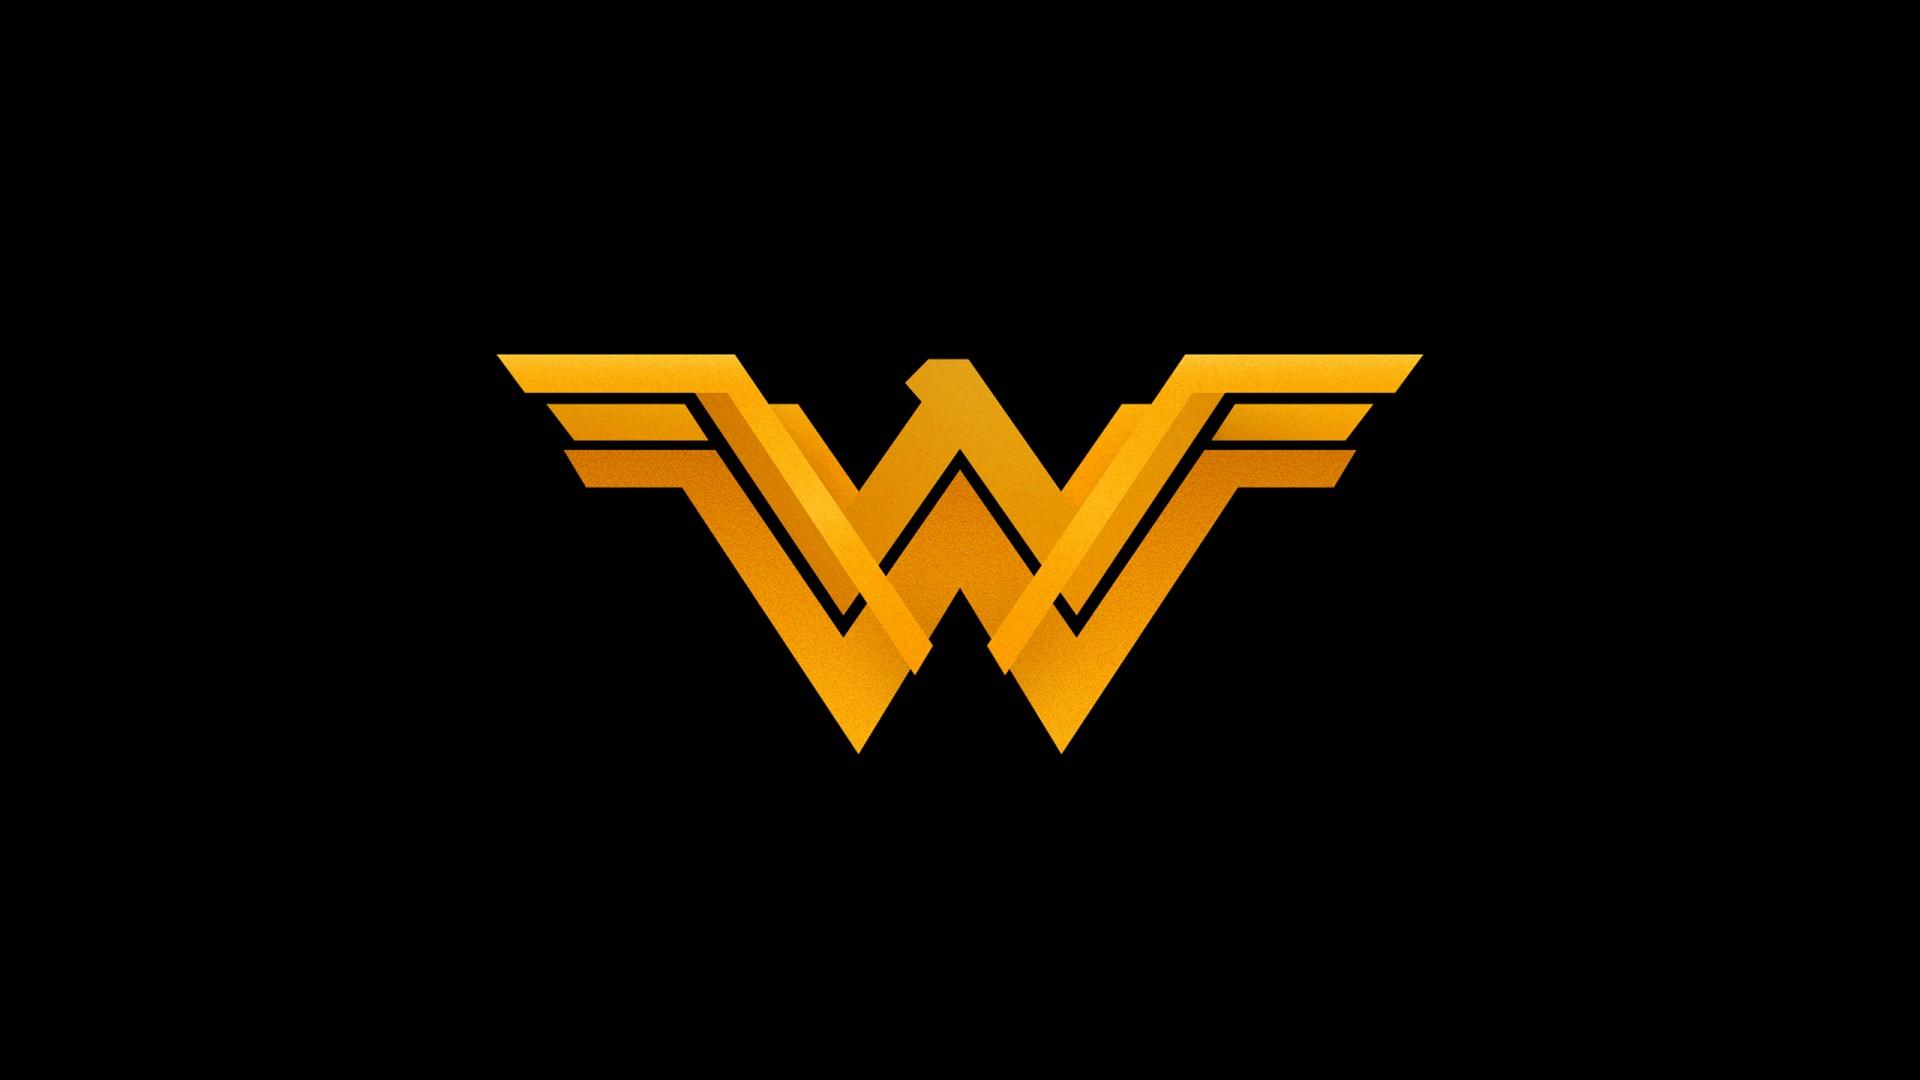 3d A Letter Wallpaper Wonder Woman Logo Wallpapers Hd Wallpapers Id 24302